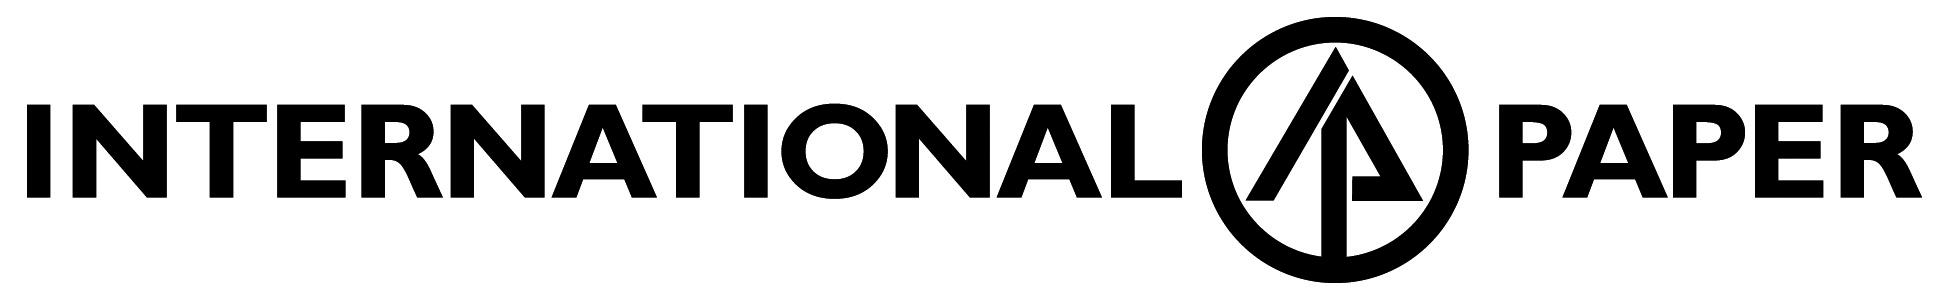 2020 International Paper Logo